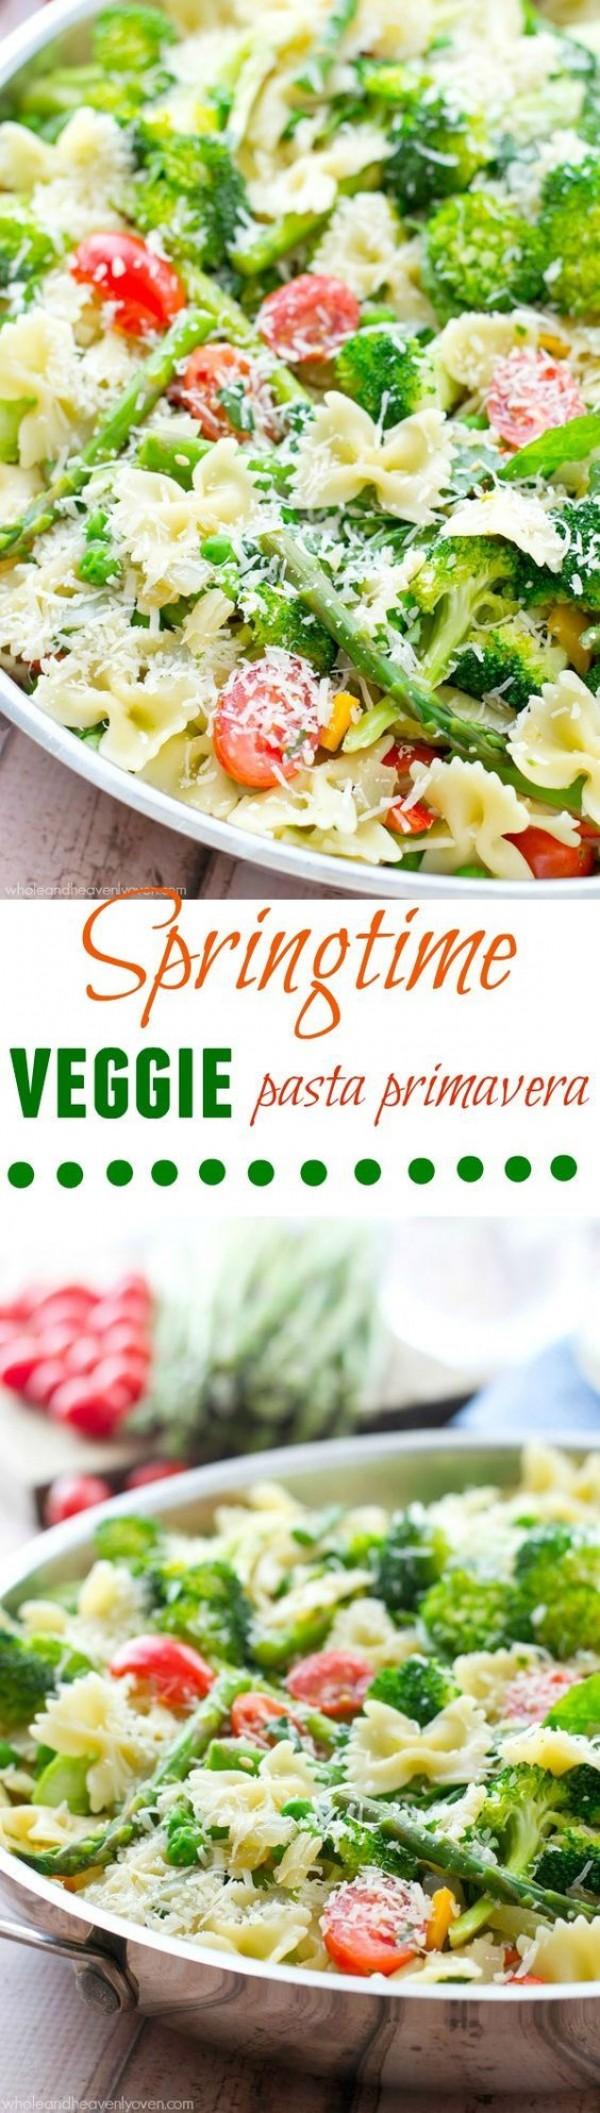 Get the recipe Springtime Veggie Pasta Primavera @recipes_to_go